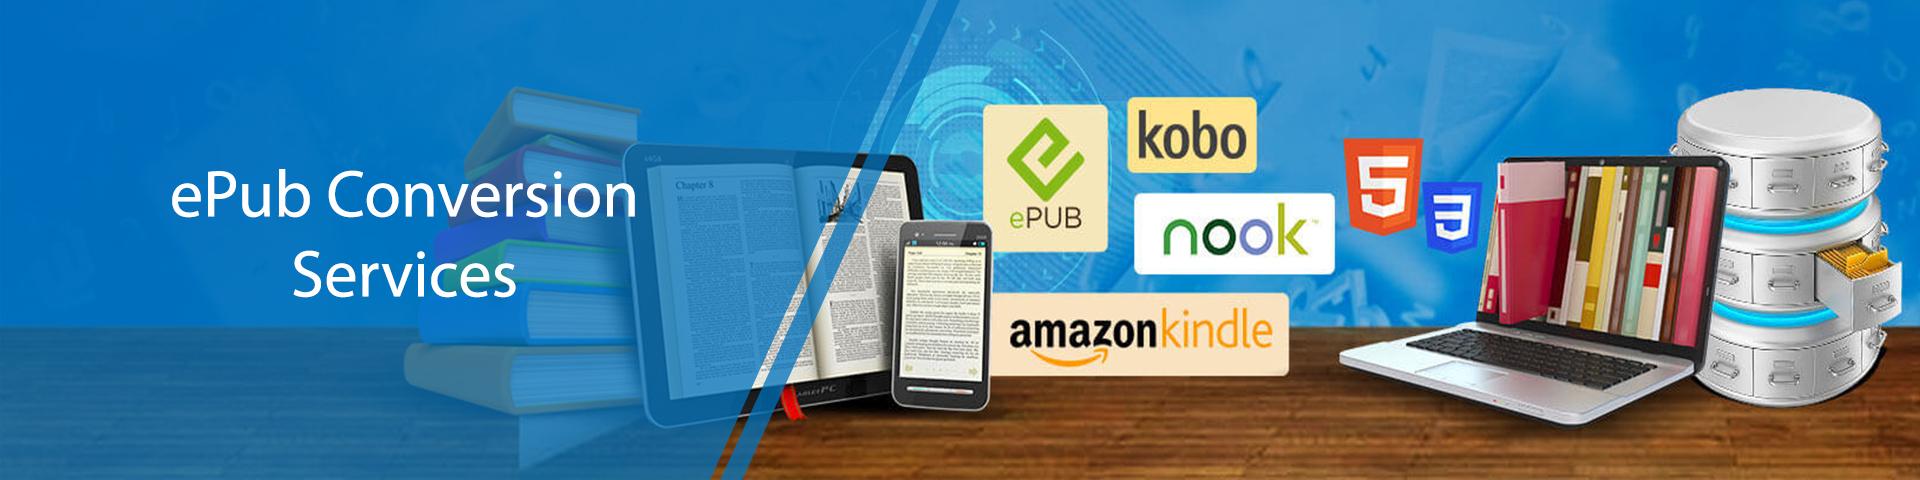 ePub Conversion Services